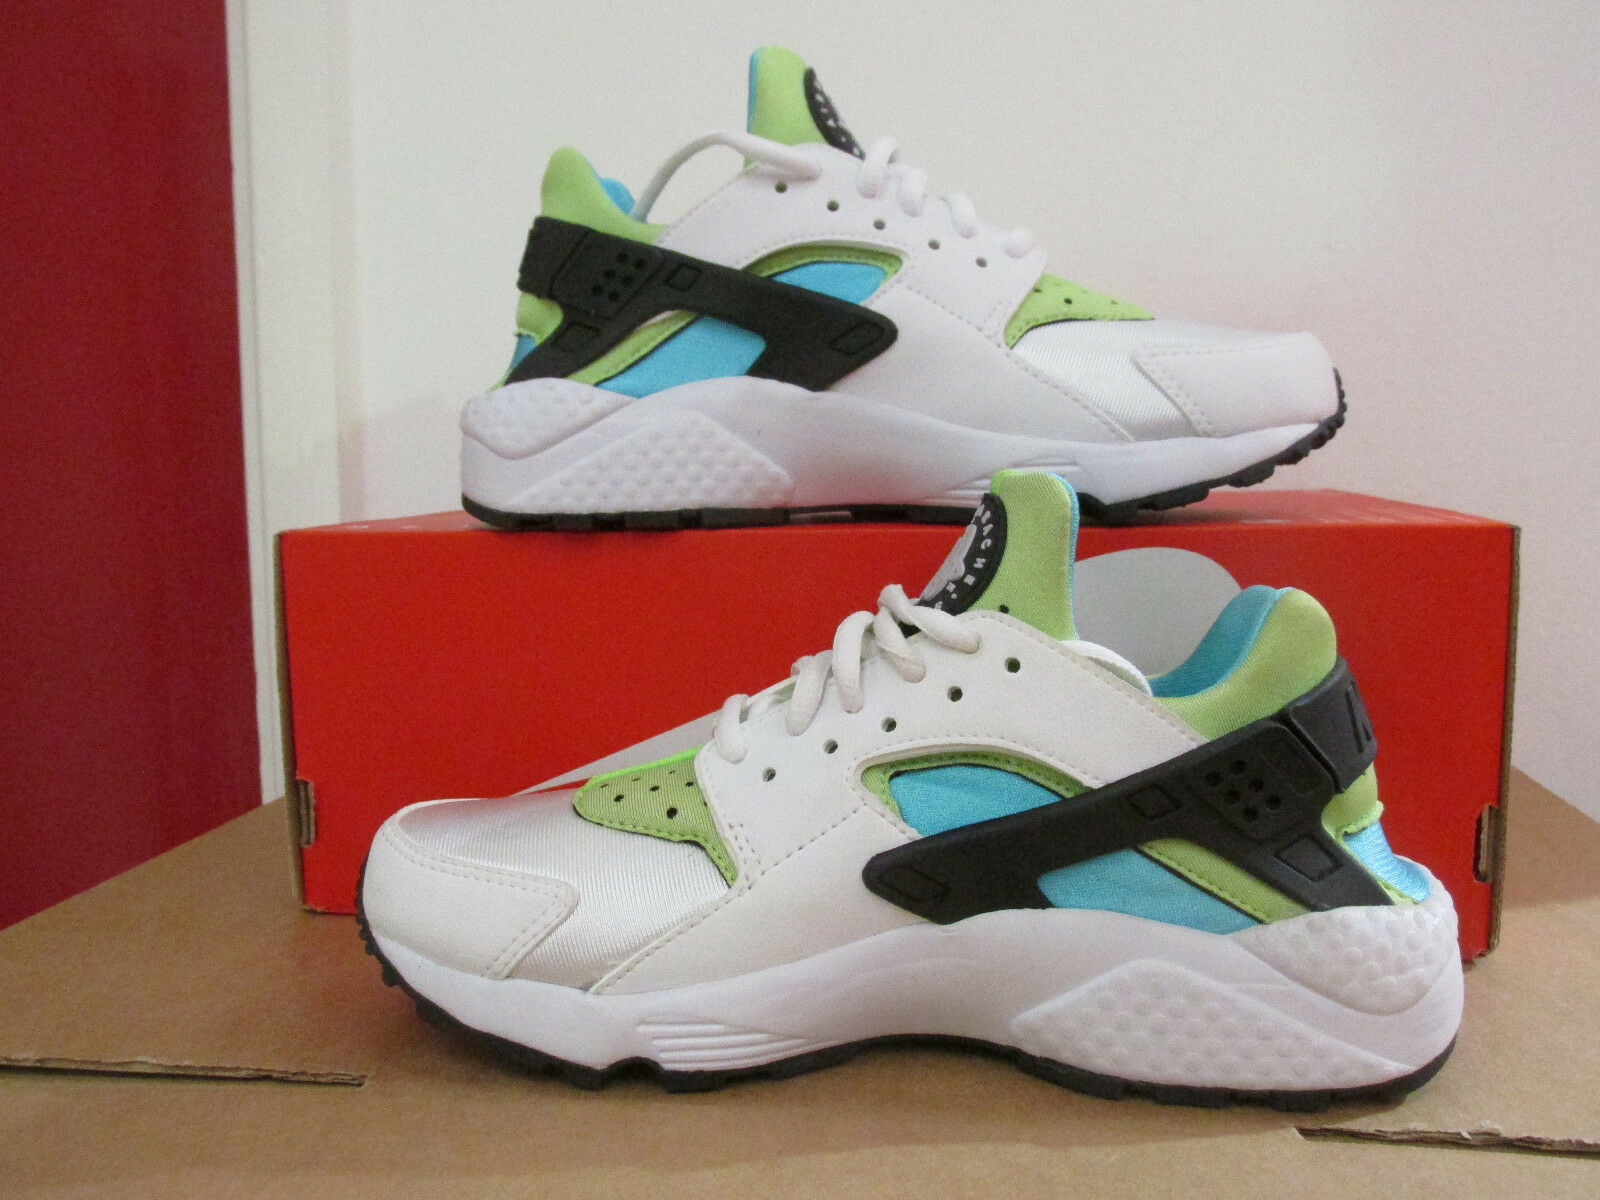 Nike Femmes Air Huarache courir Basket Course 634835 100 Baskets Enlèvement